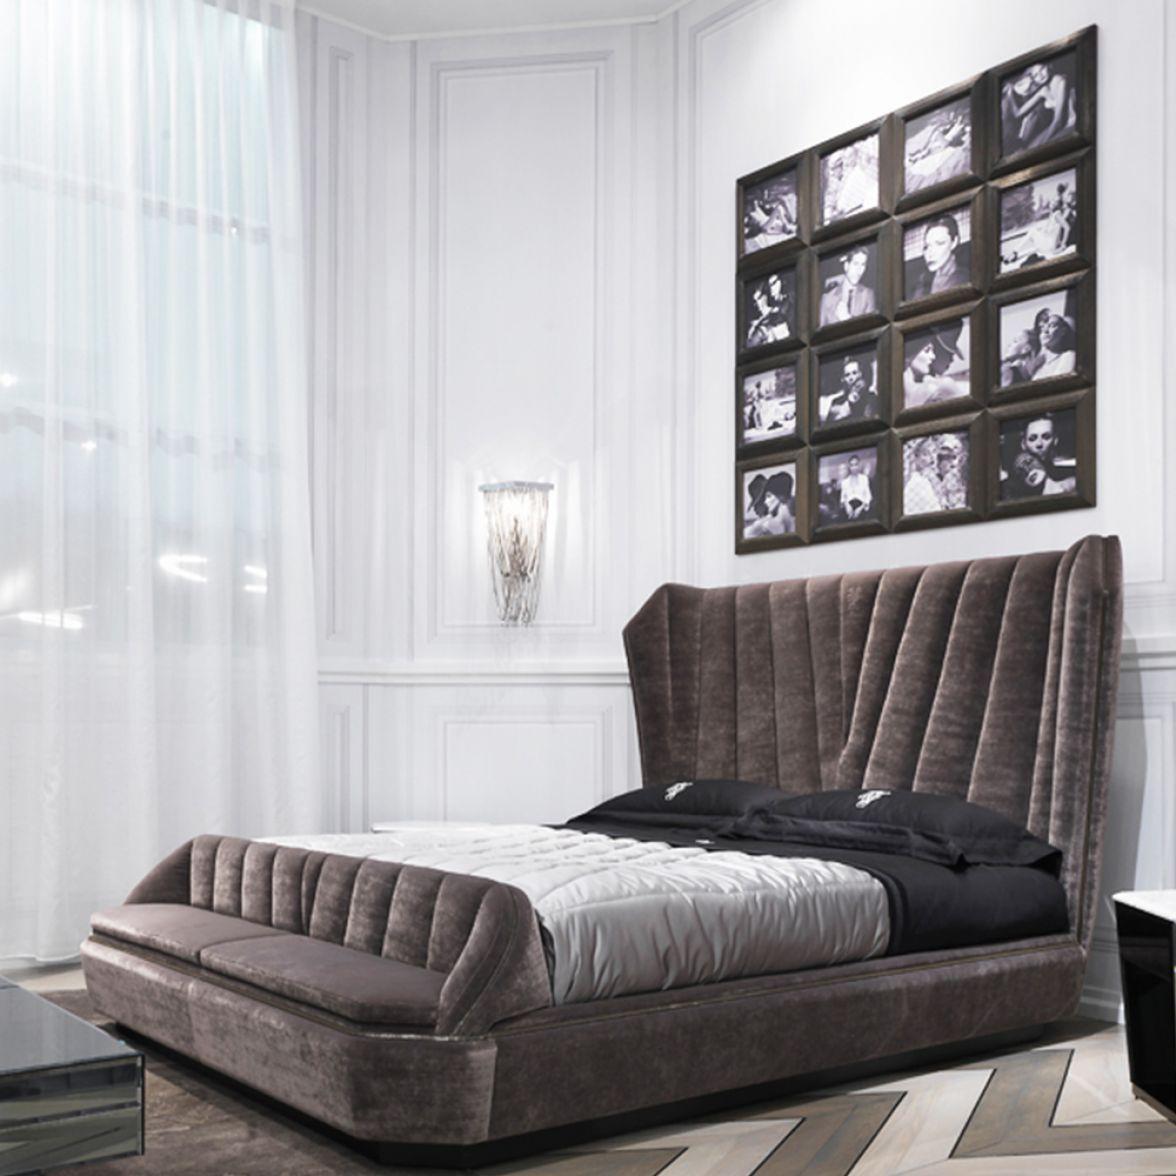 Кровать Hemingway фото цена